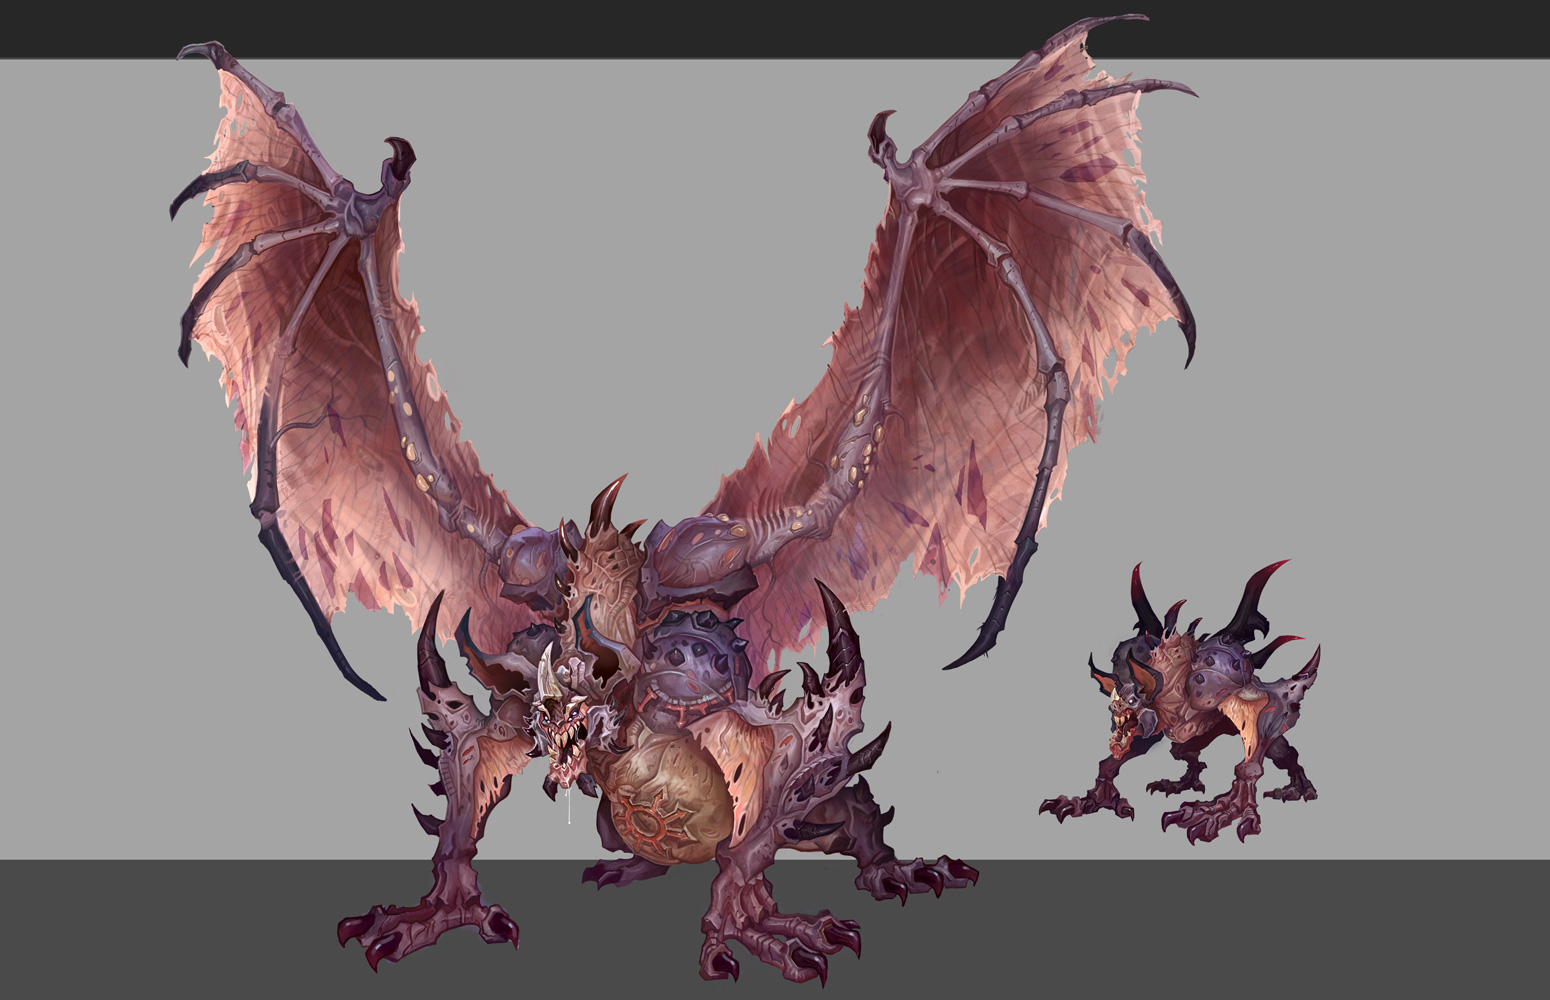 [E3] Eternal Crusade, un MMO Warhammer 40K - Page 3 2